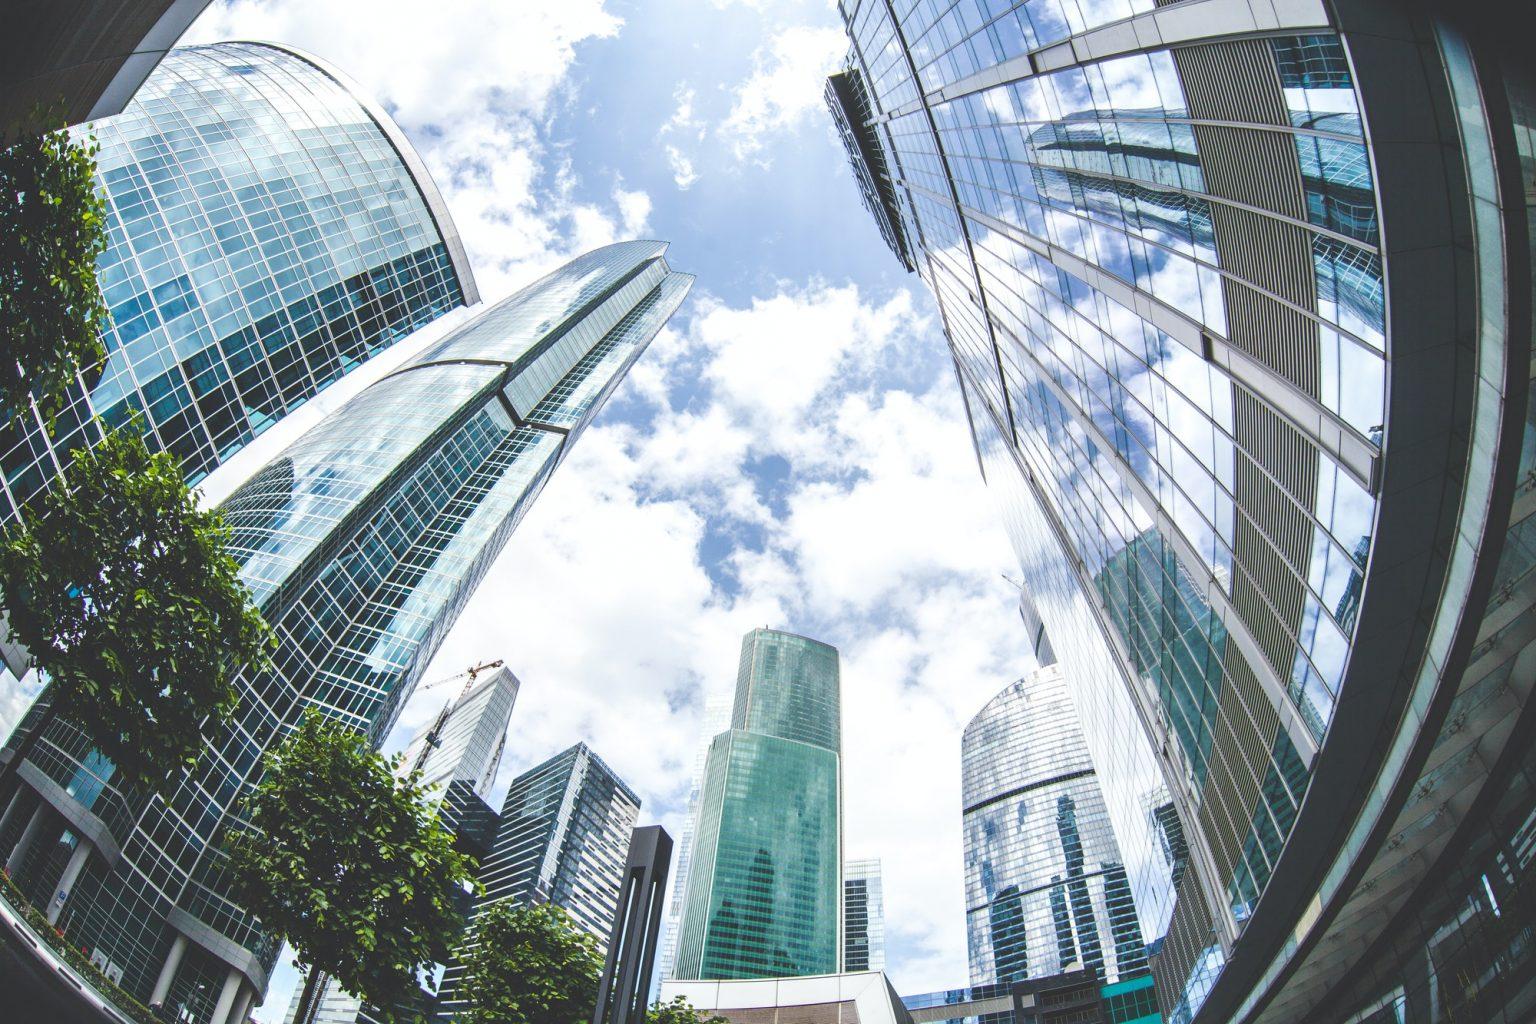 urban landscape of city skyscrapers, fish eye